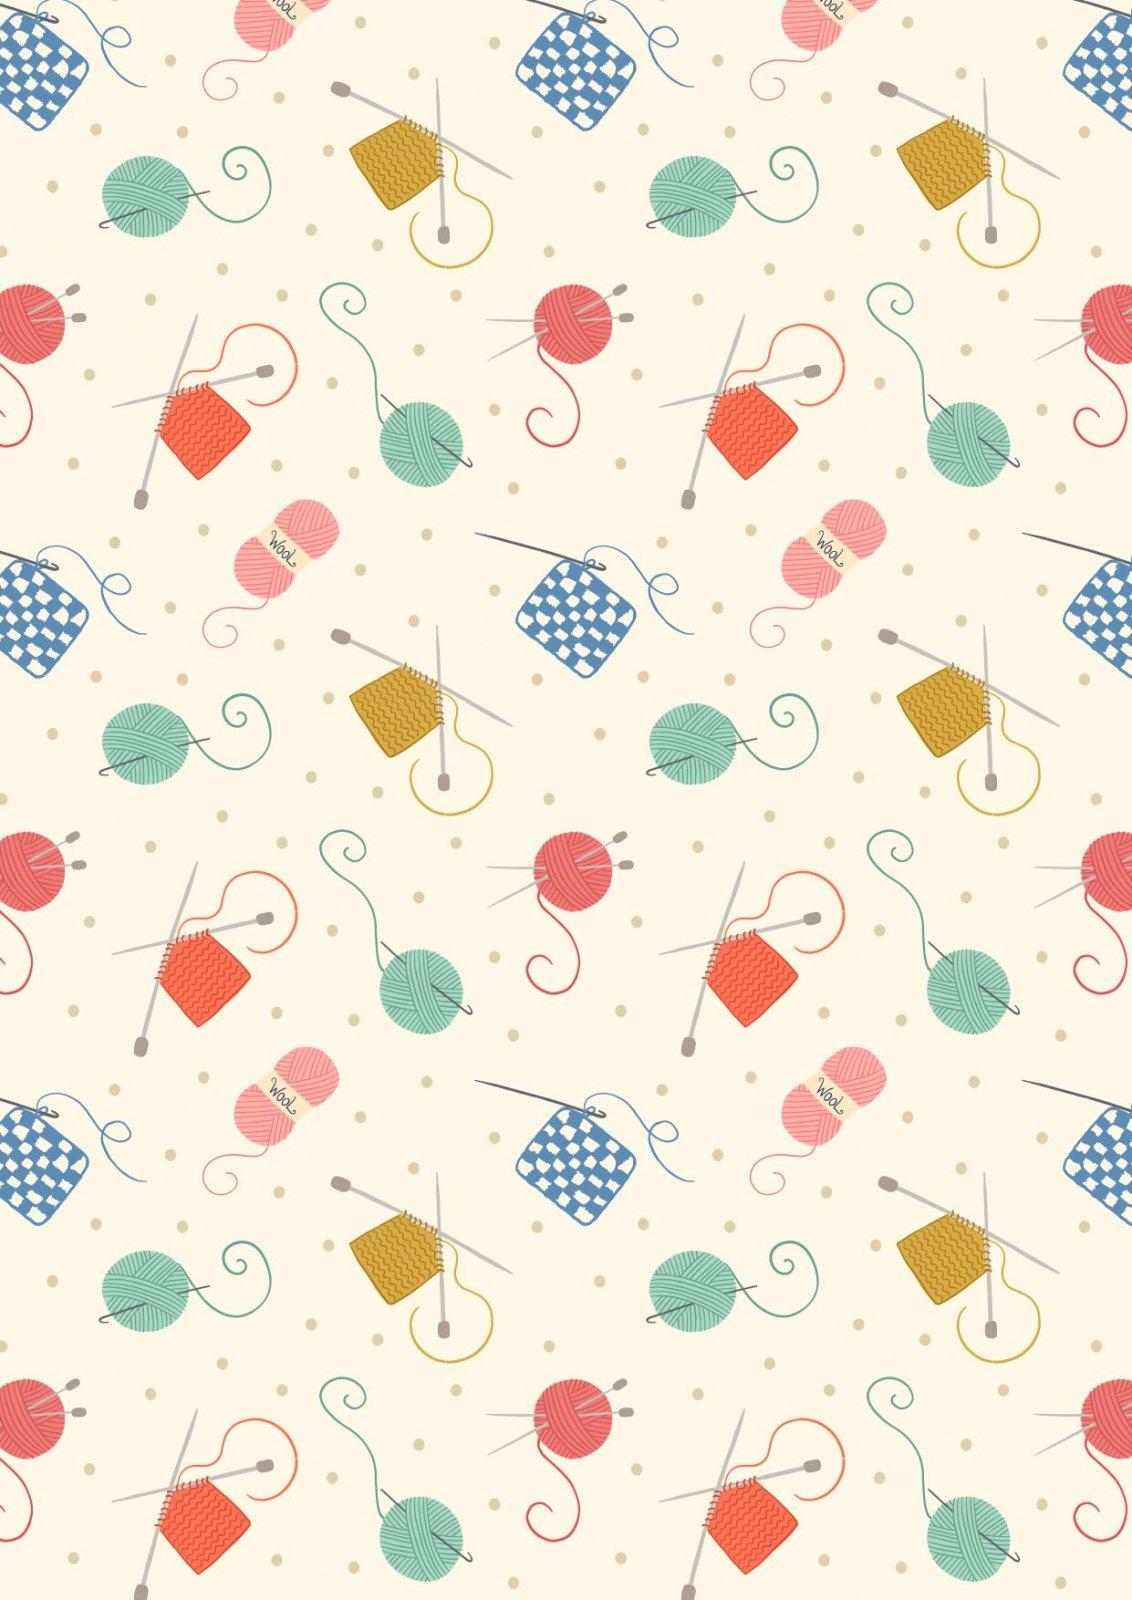 Crafts - Knitting & Crochet- Cream